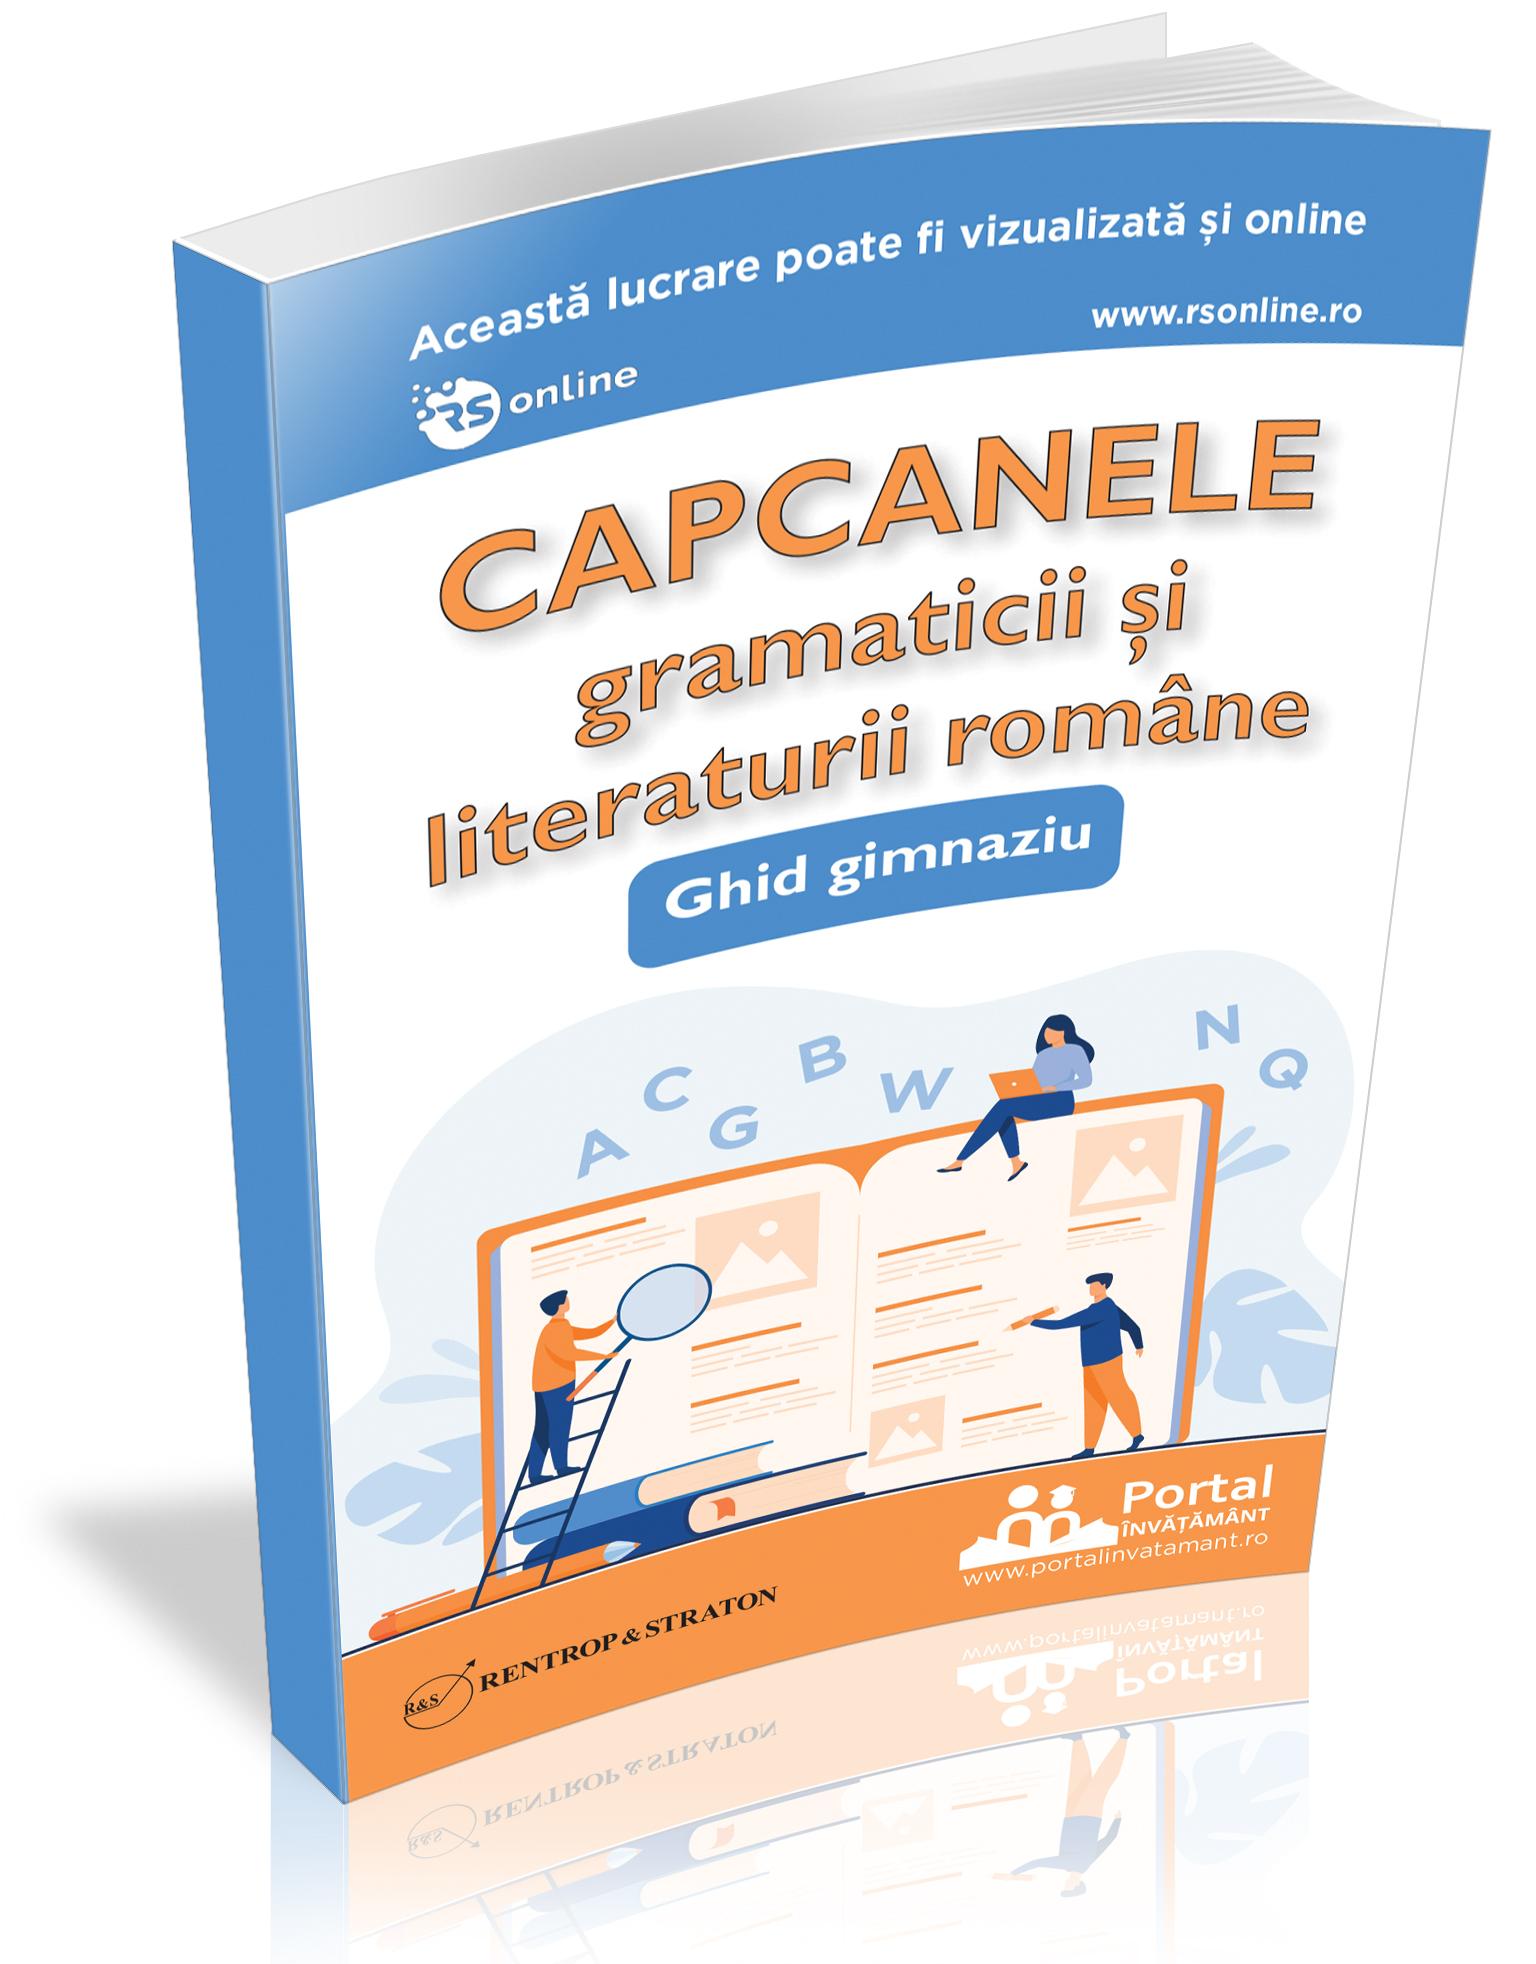 Capcanele gramaticii si literaturii romane: ghid gimnazial